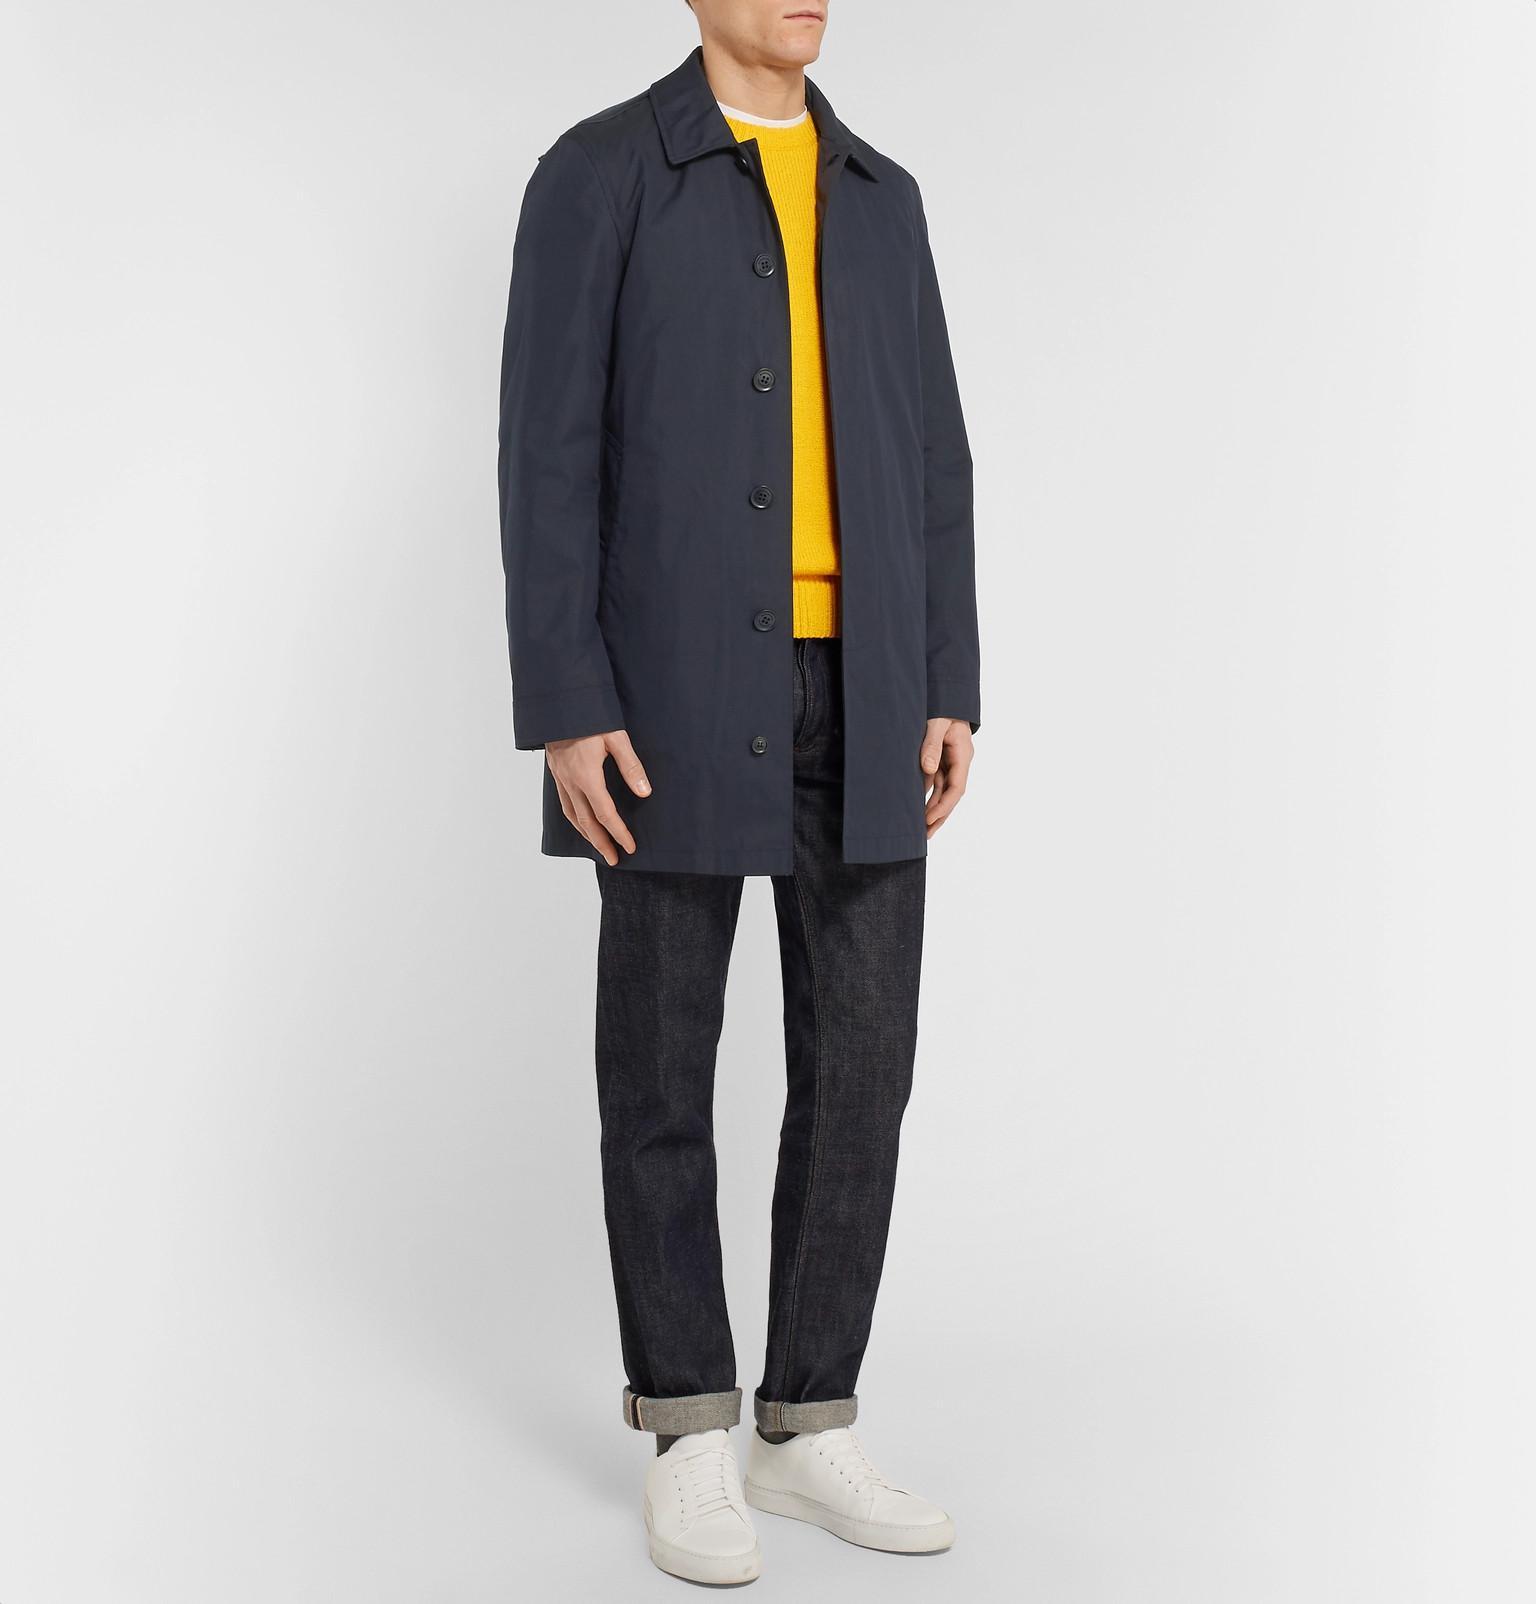 Fullscreen Gilet Burberry Detachable Blue Gabardine Men Blend For Coat Lyst Hooded Cotton View With rOwrax4